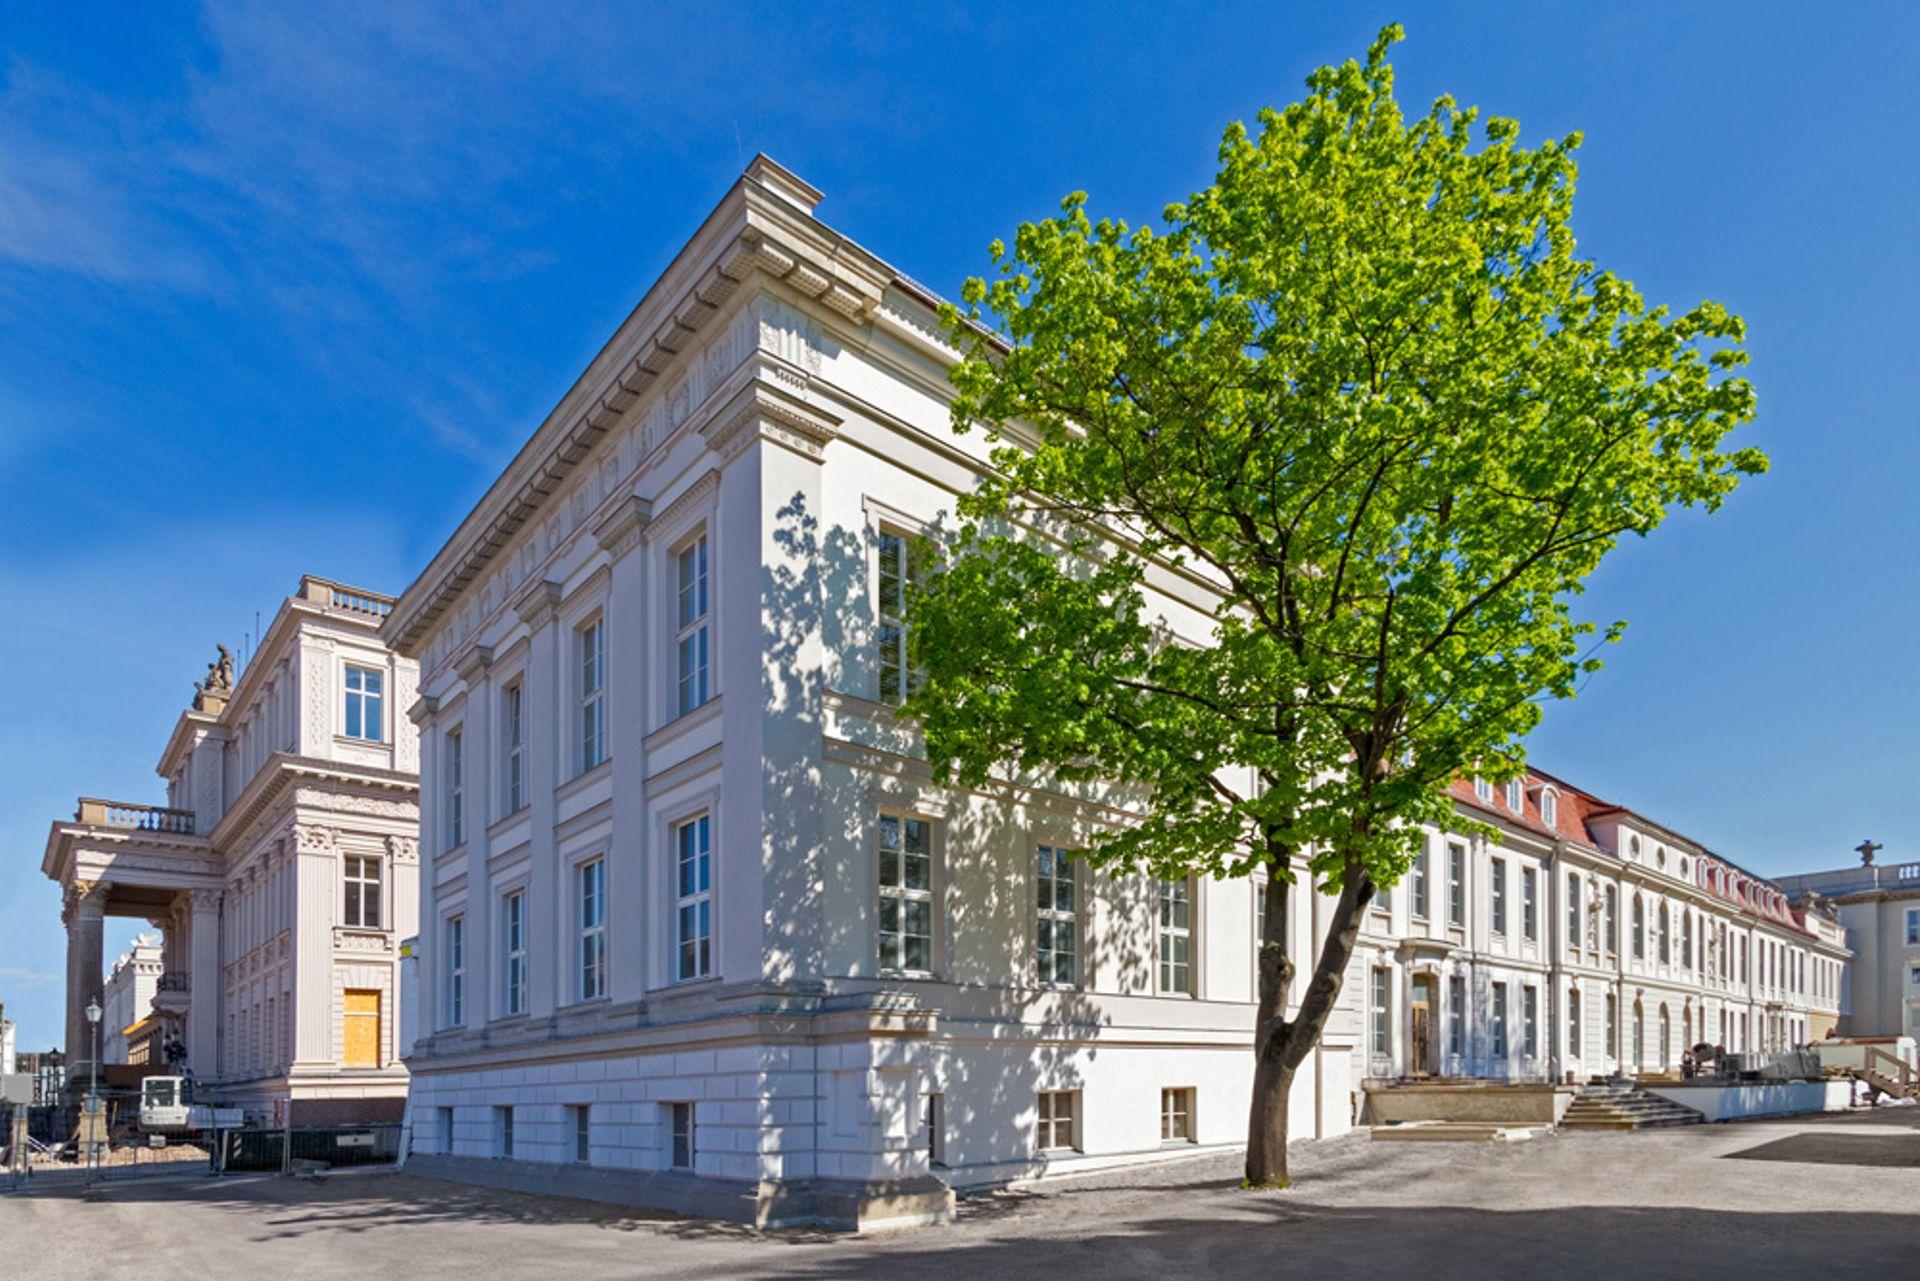 The Palais Populaire is located in the historic Prinzessinnenpalais on Unter den Linden Deutsche Bank